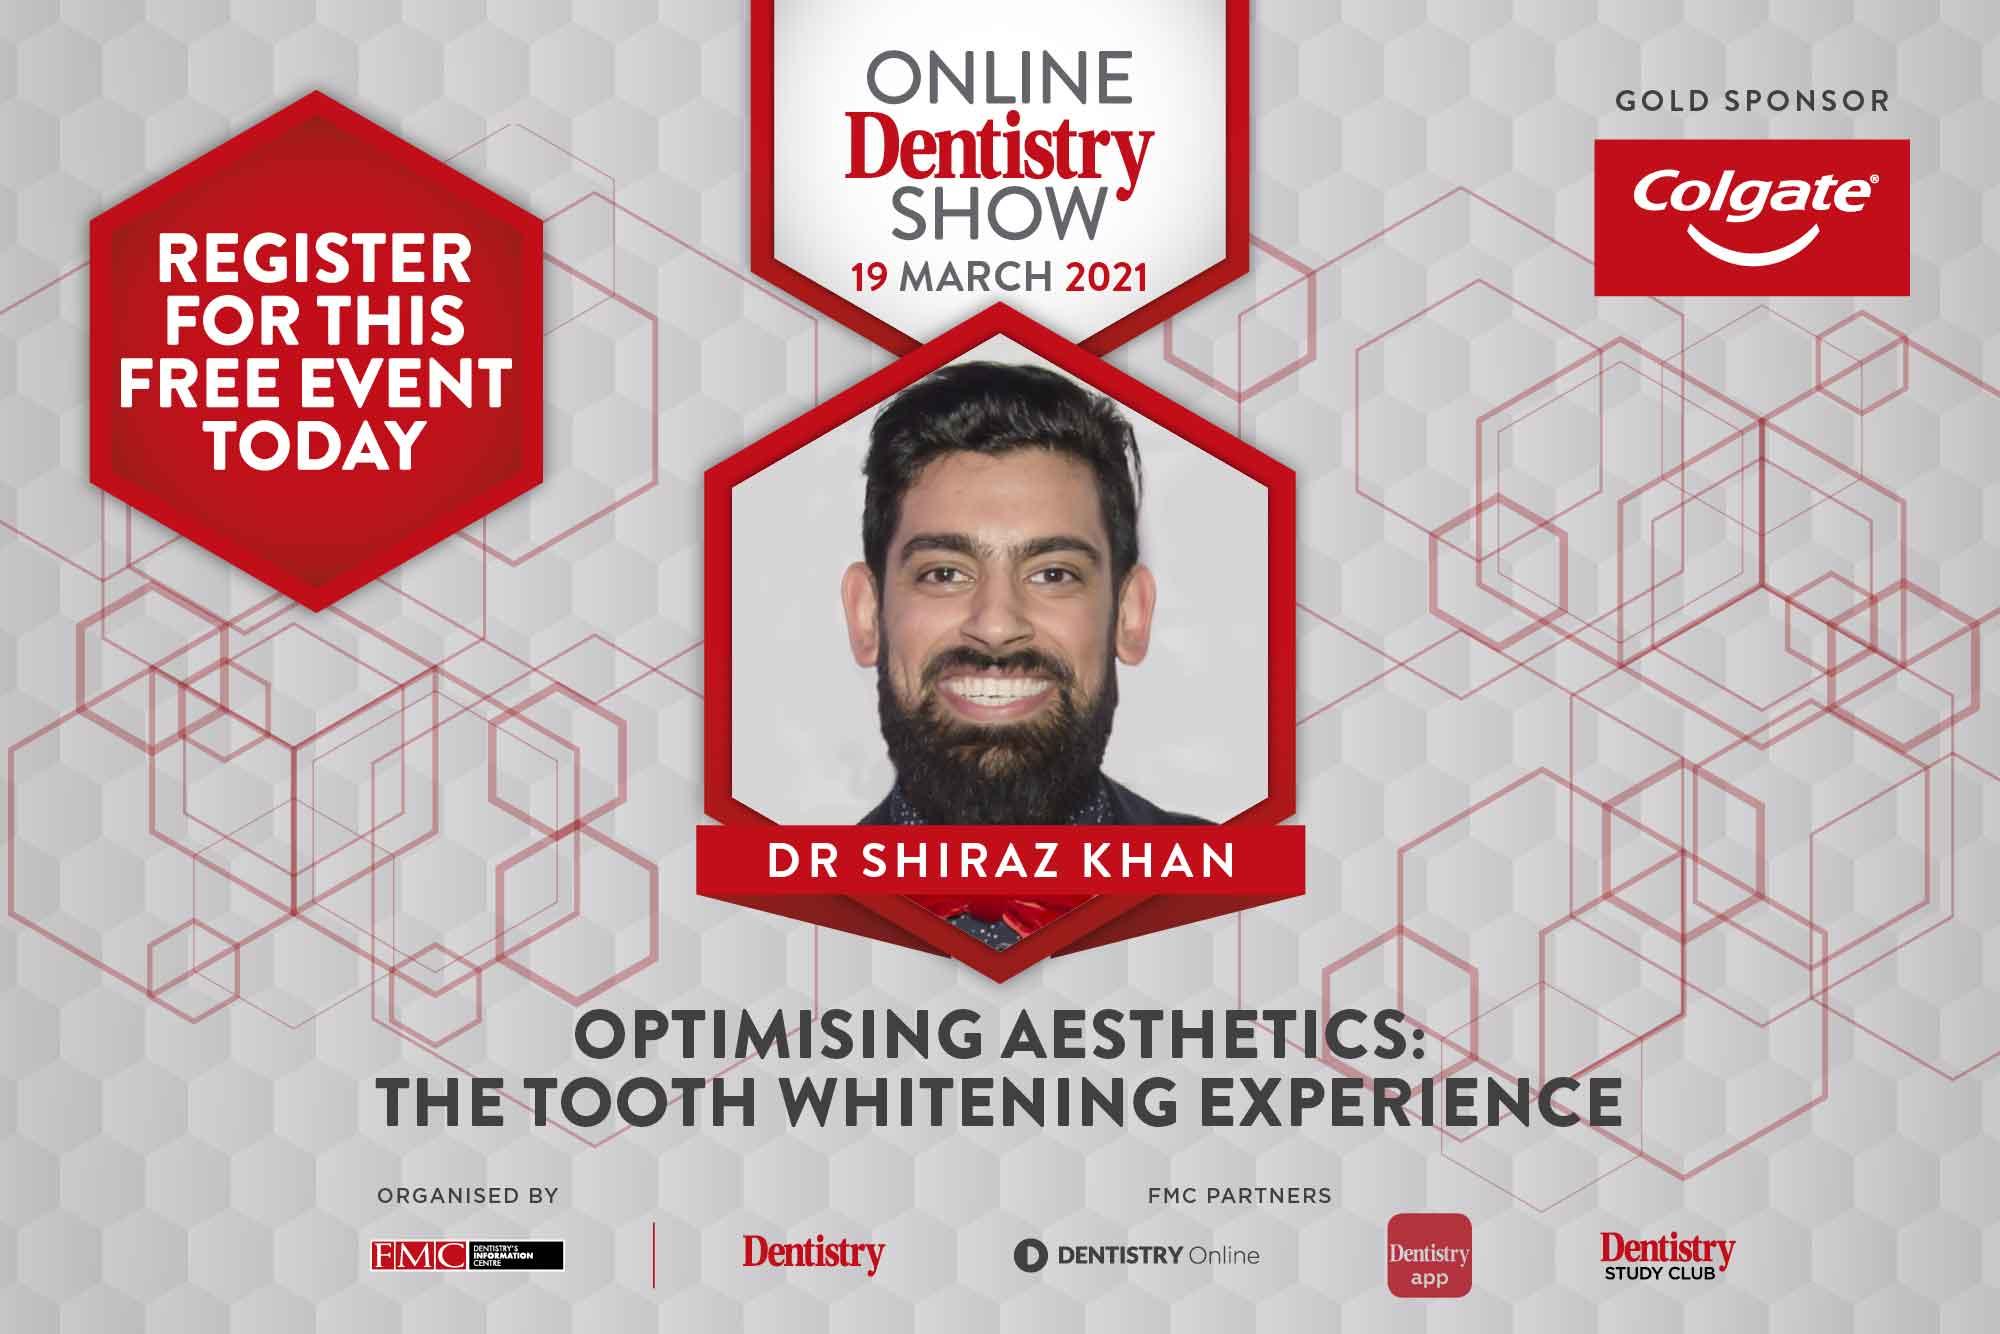 Shiraz Khan at the Online Dentistry Show